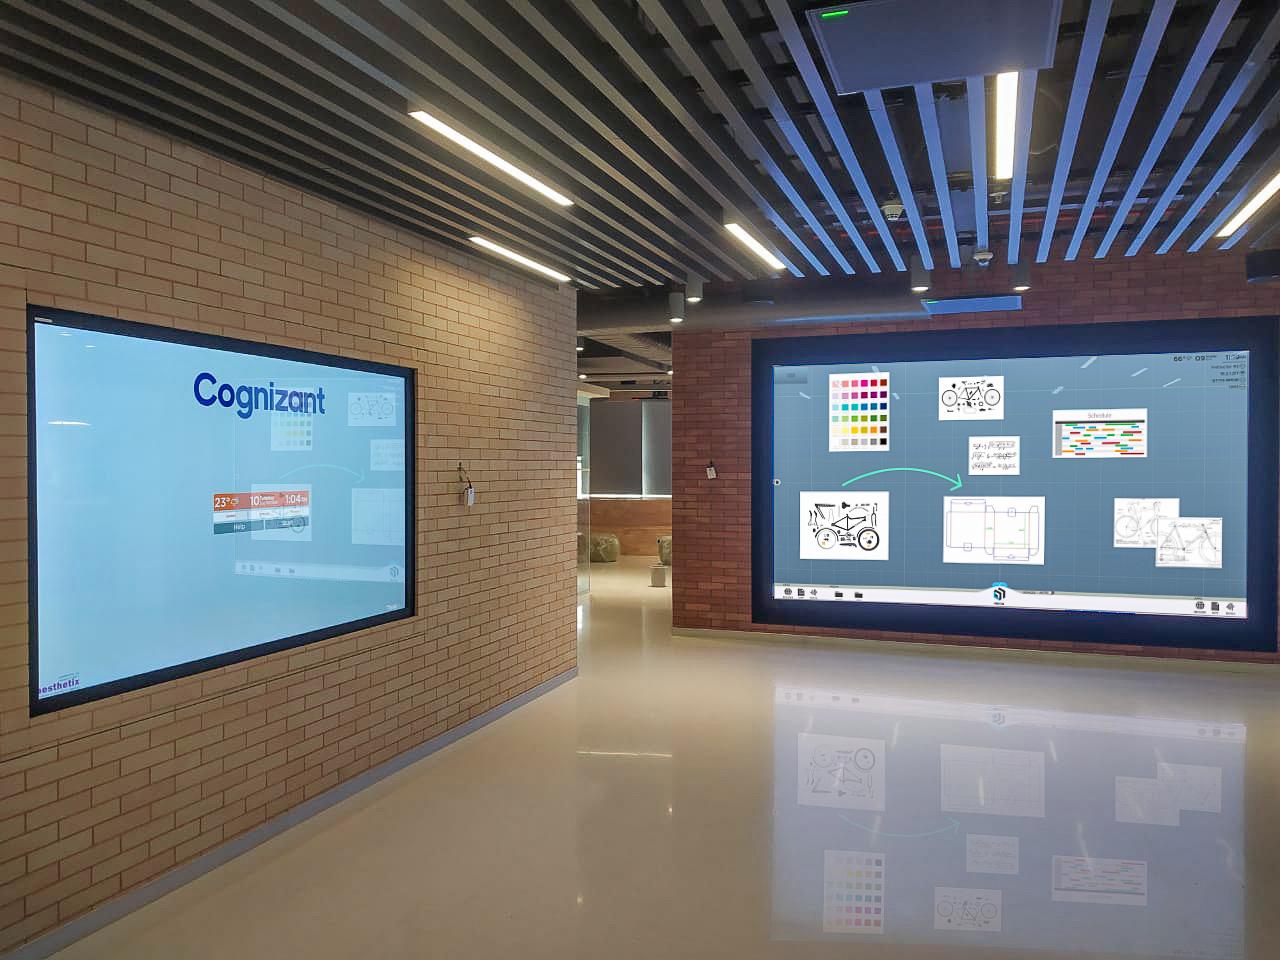 T1V-ThinkHub-BYOD-Collaboration-Cognizant-Pune-India-LED-Video-Walls-98%20-Single-Panels-MultiSite-September-2019